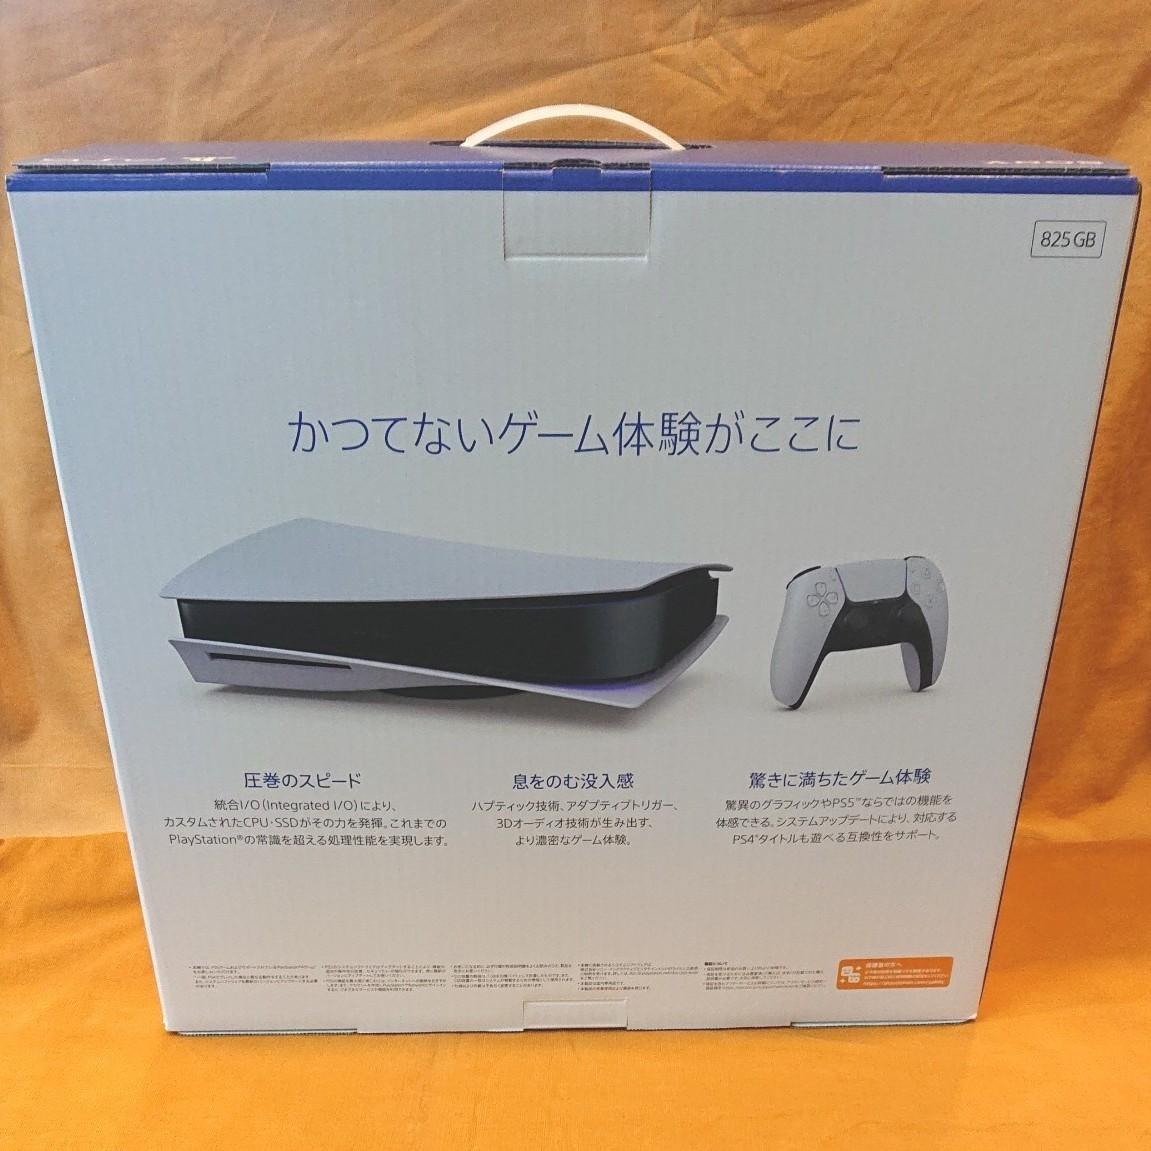 PlayStation5 プレイステーション5 本体 CFI-1000A01 通常版 ディスクドライブ搭載(新品未開封)